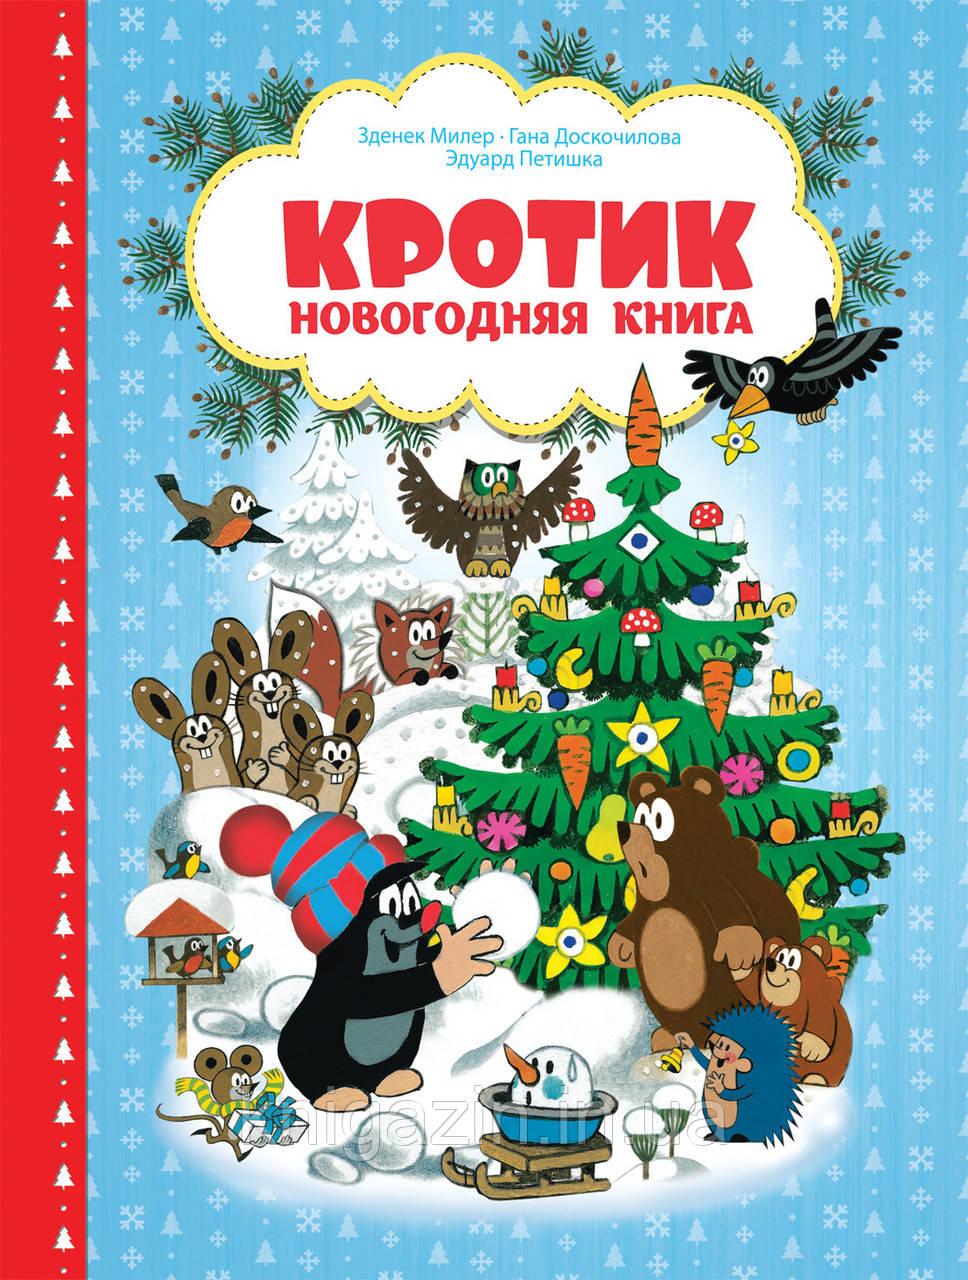 Милер З., Доскочилова Г.: Кротик. Новогодняя книга